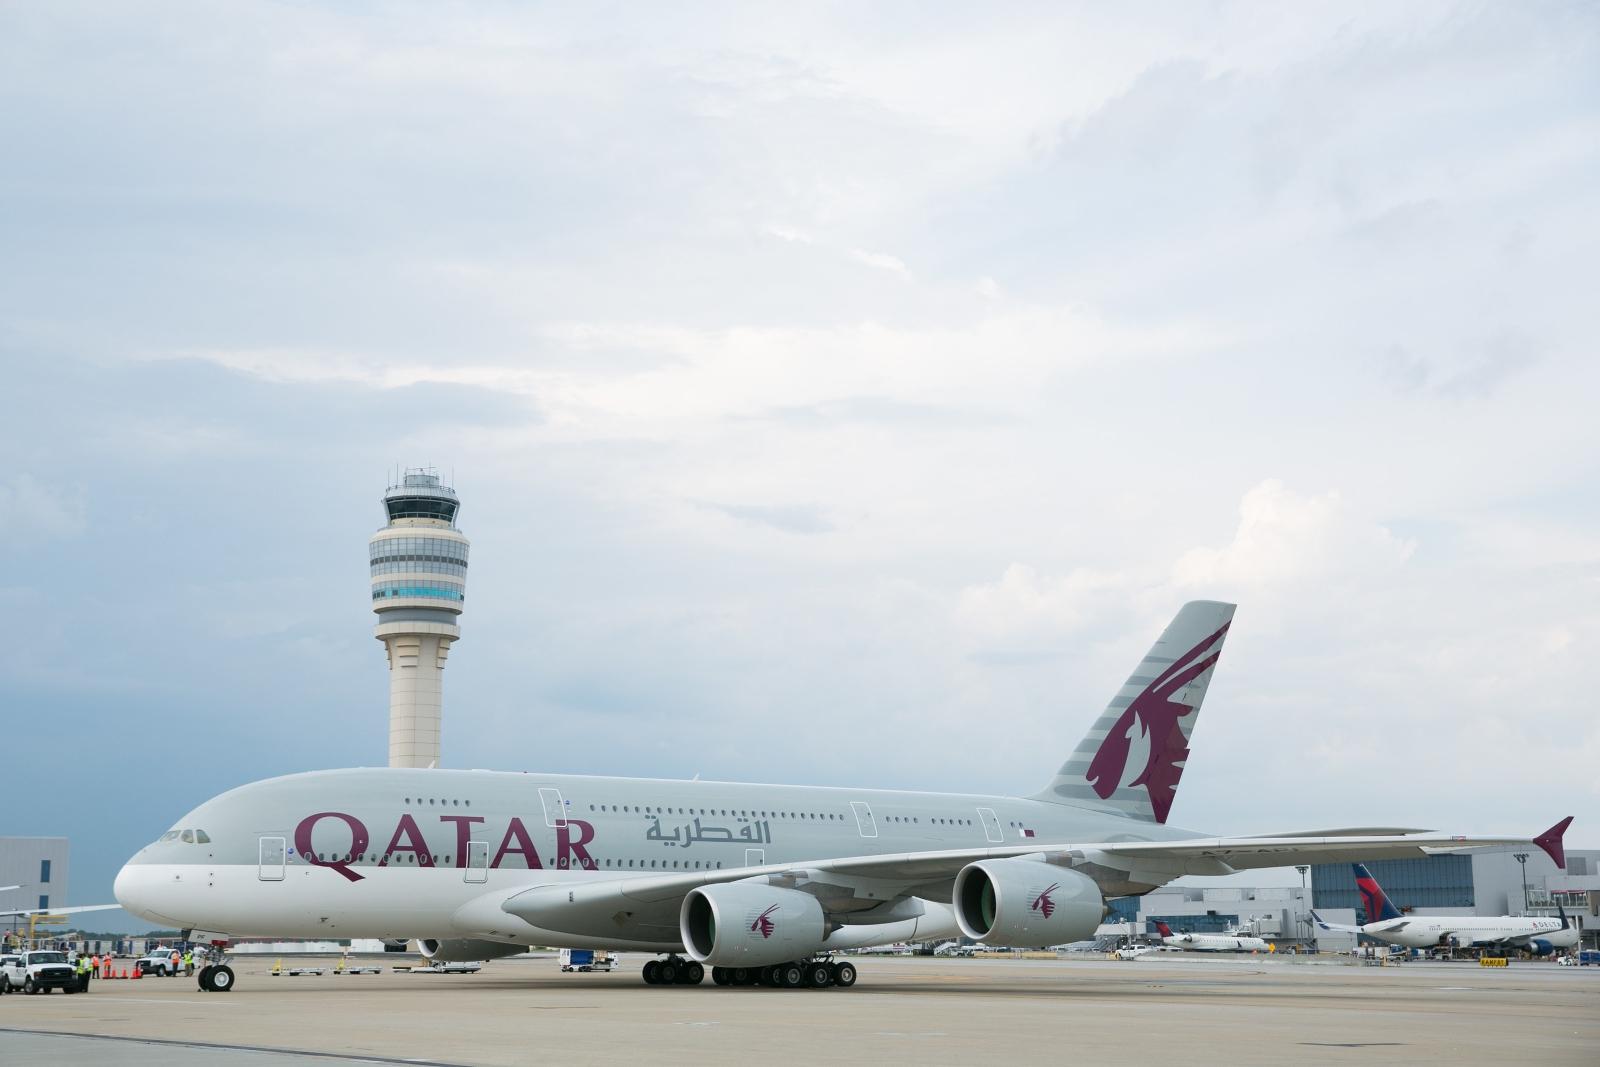 Qatar Airways A380 parked on the tarmac in Atlanta   (Photo: Qatar Airways)